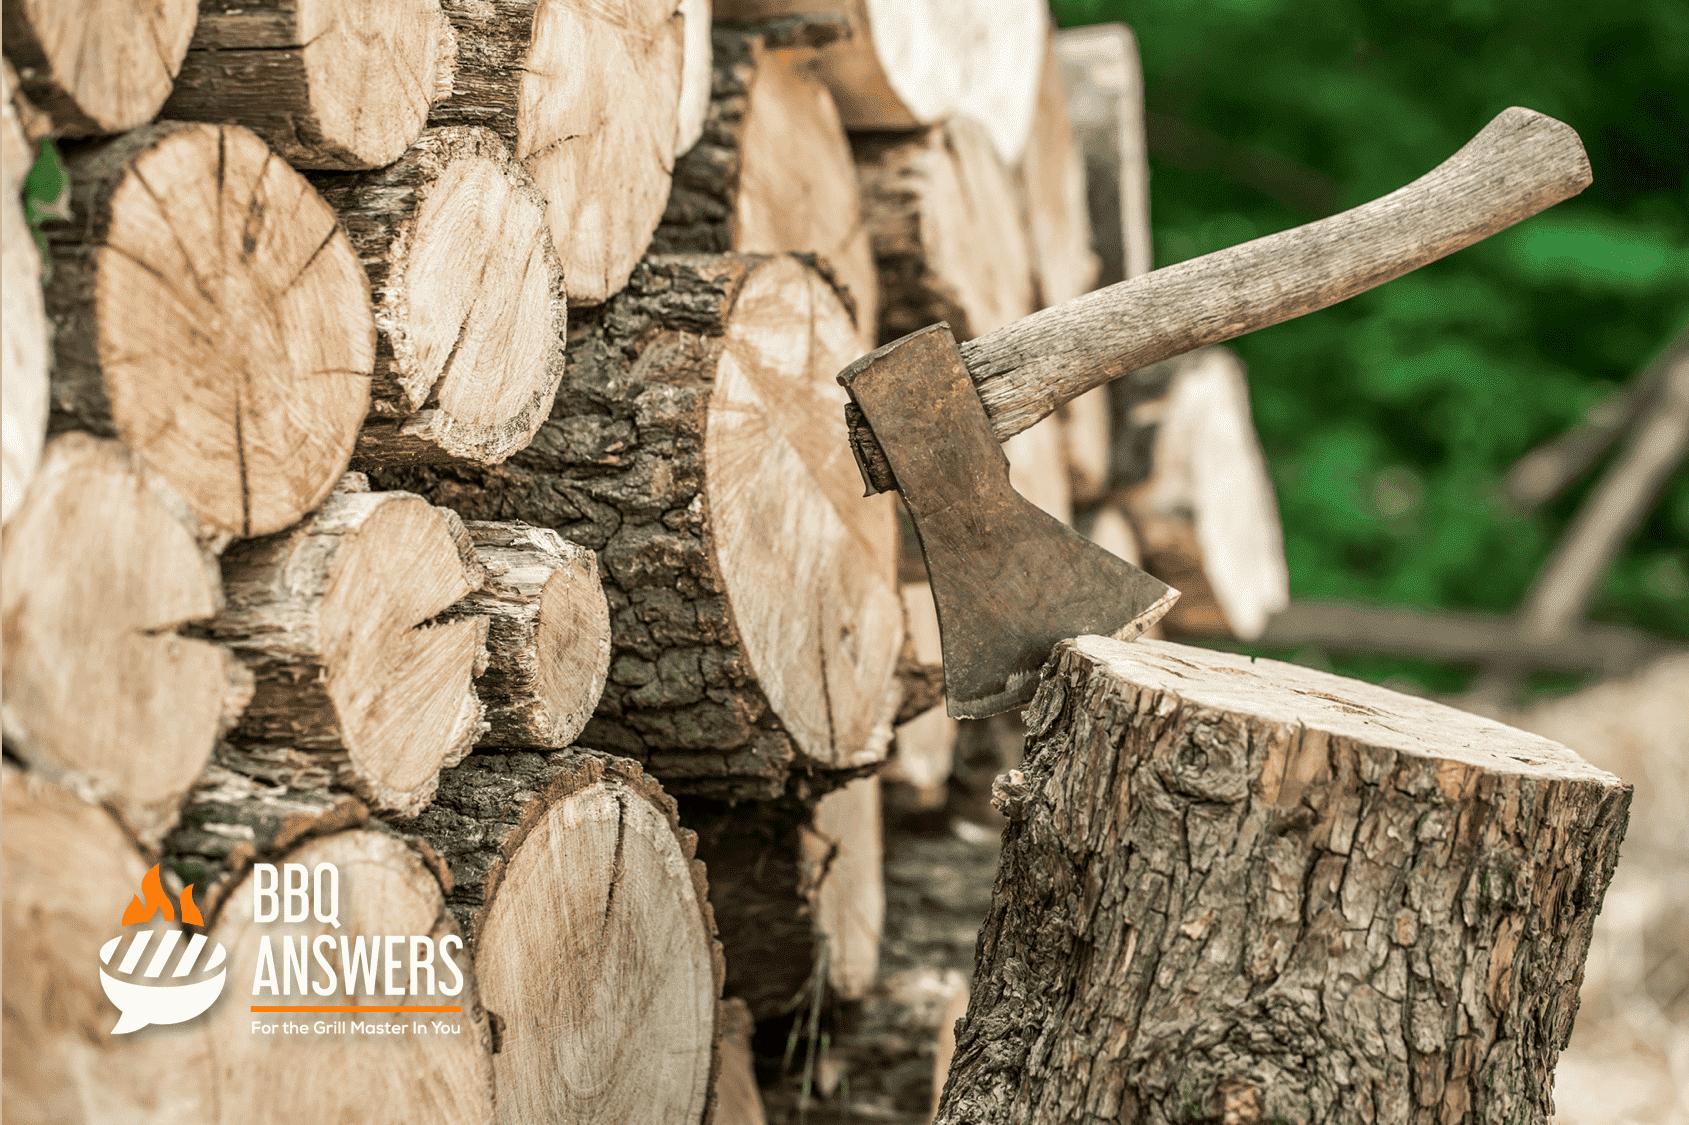 Fresh Cut Hardwood | Wood Logs | BBQanswers